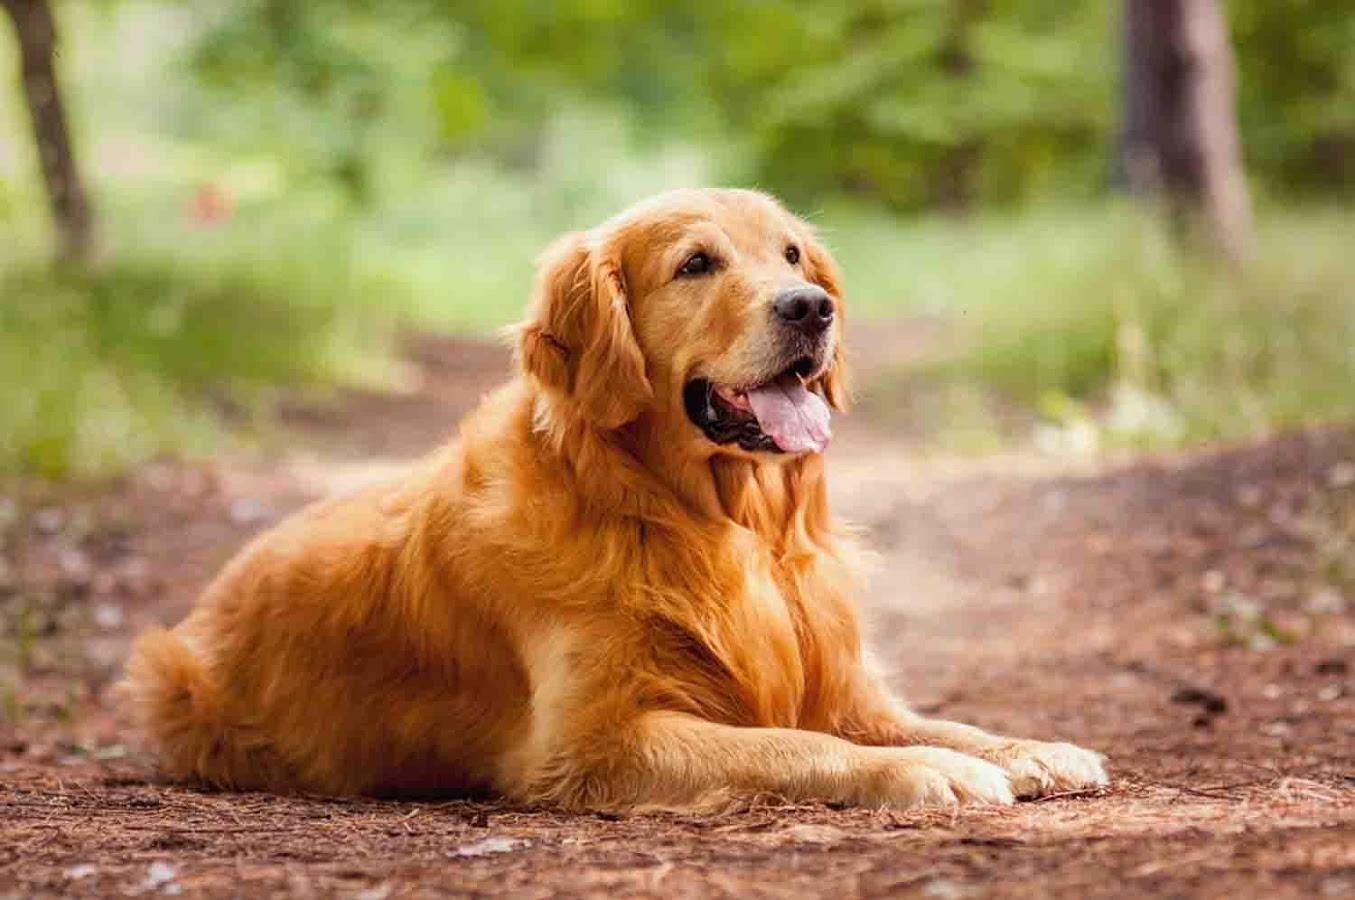 Golden retriever animals gallery